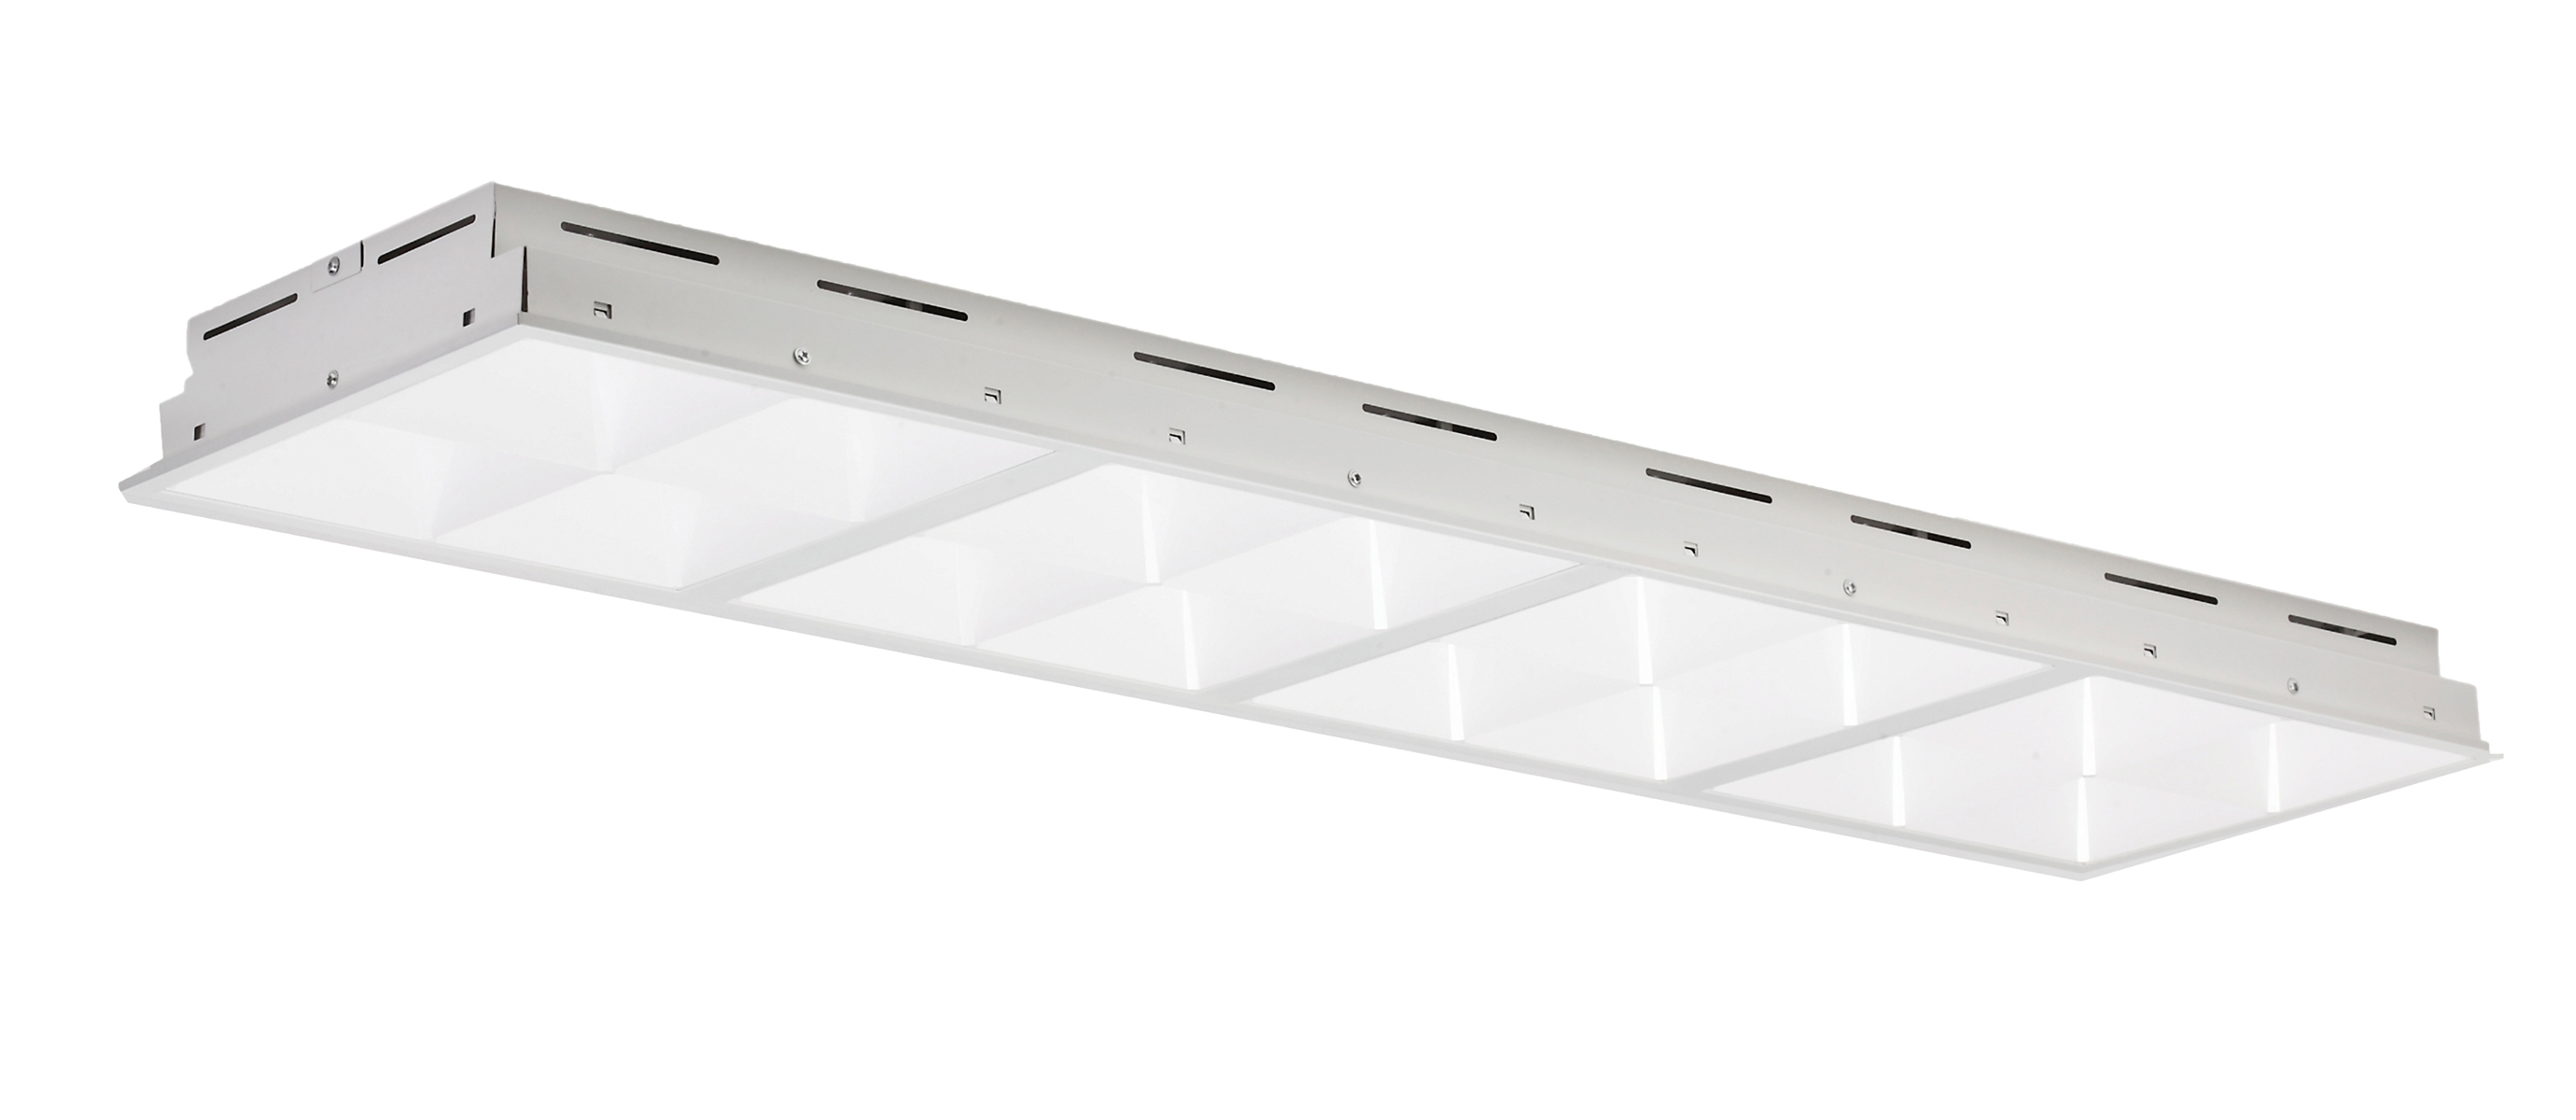 40W Low-glare LED light panel (UGR16) 4000K 80RA 125LM W